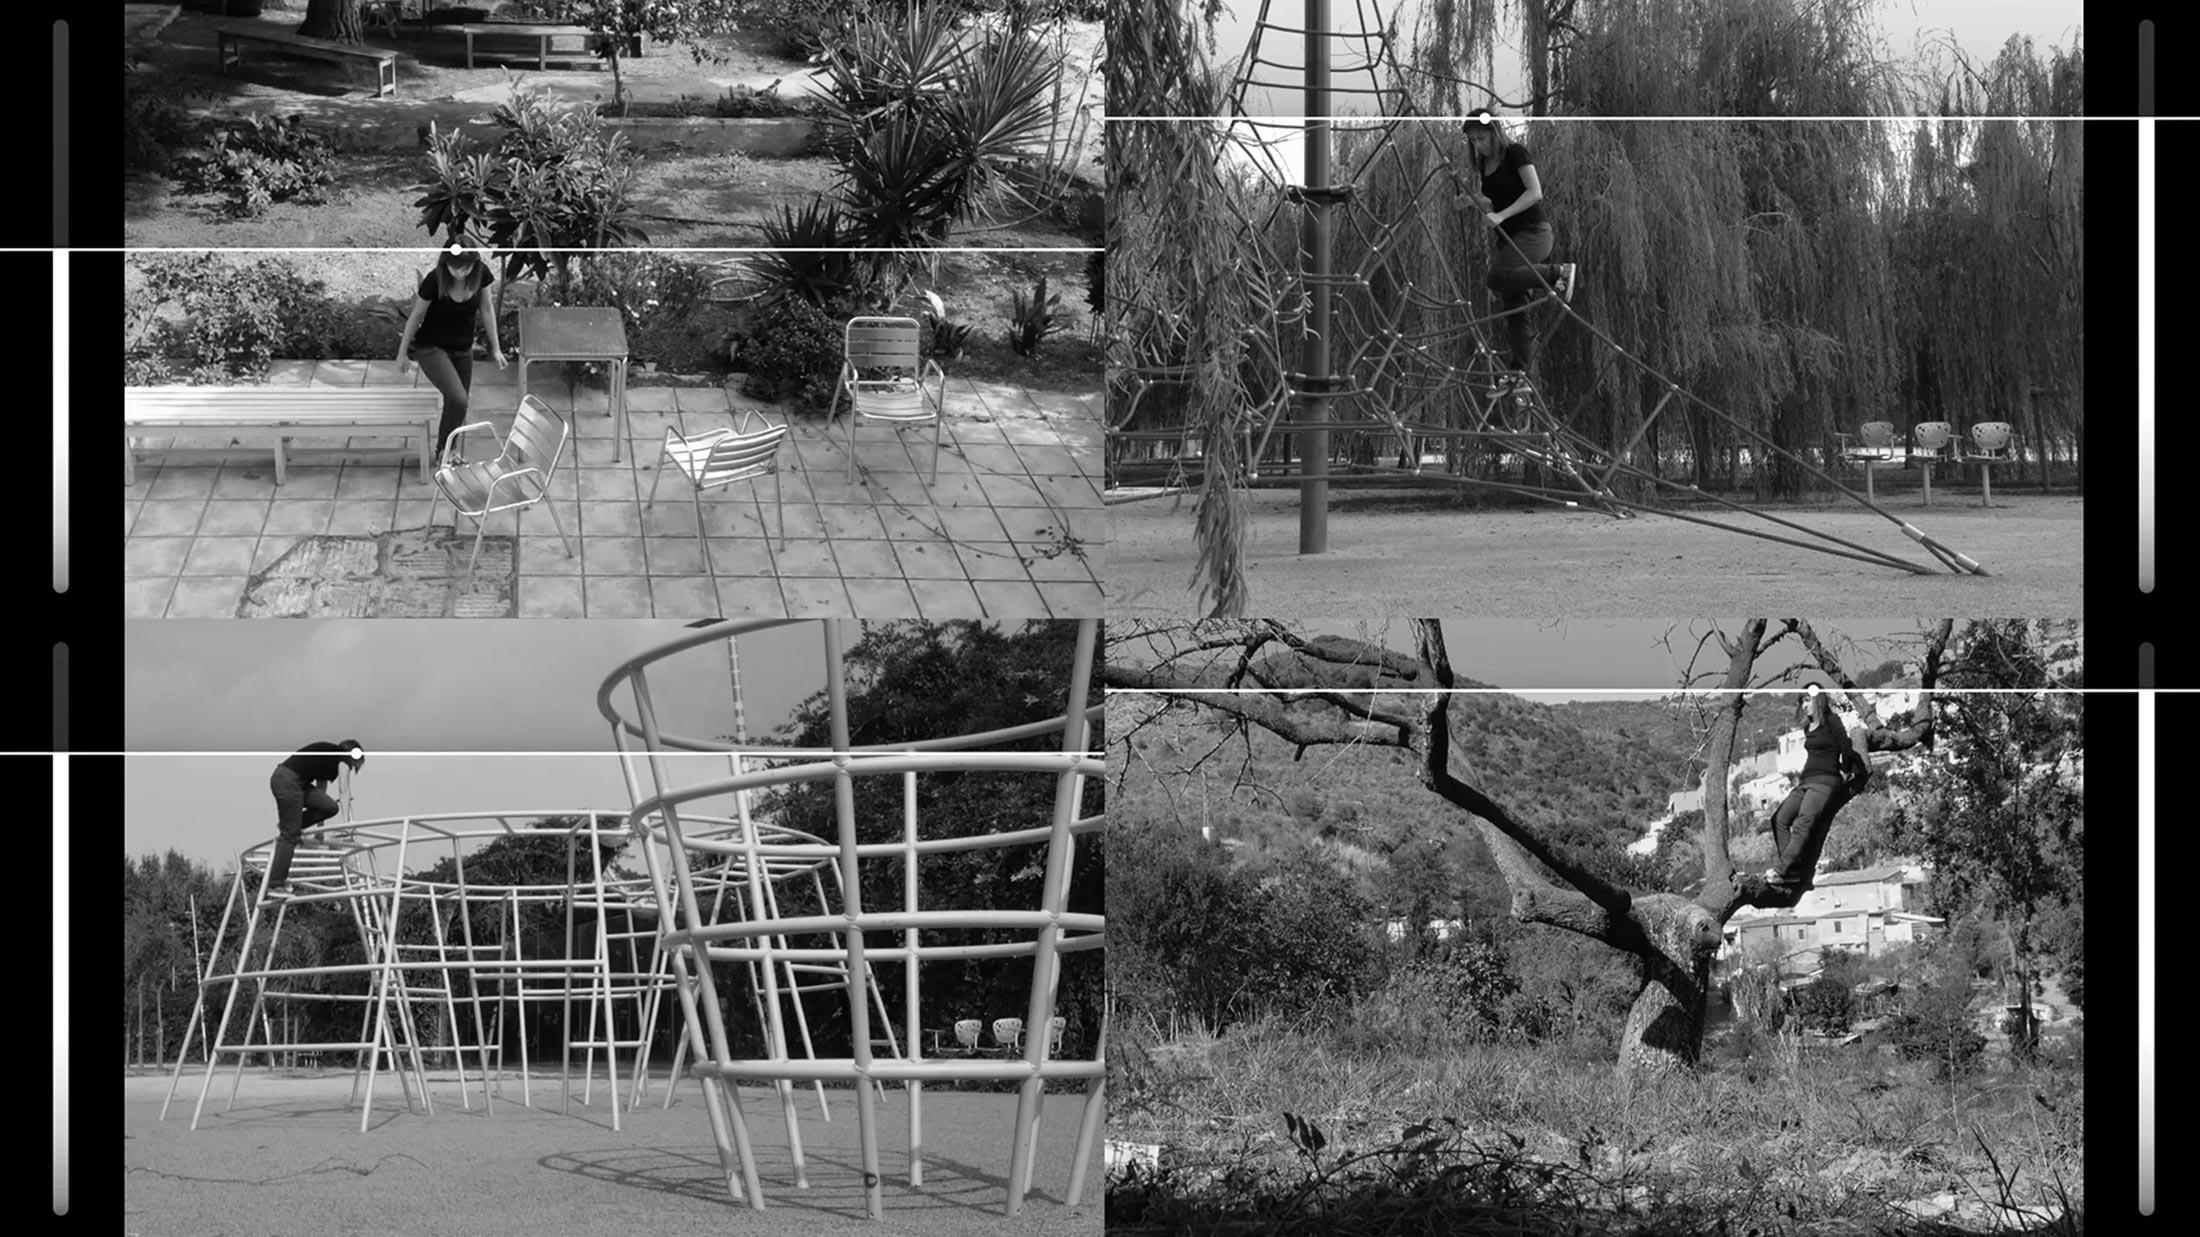 Ewa Doroszenko – The same horizon repeated at every moment of the walk, video 02